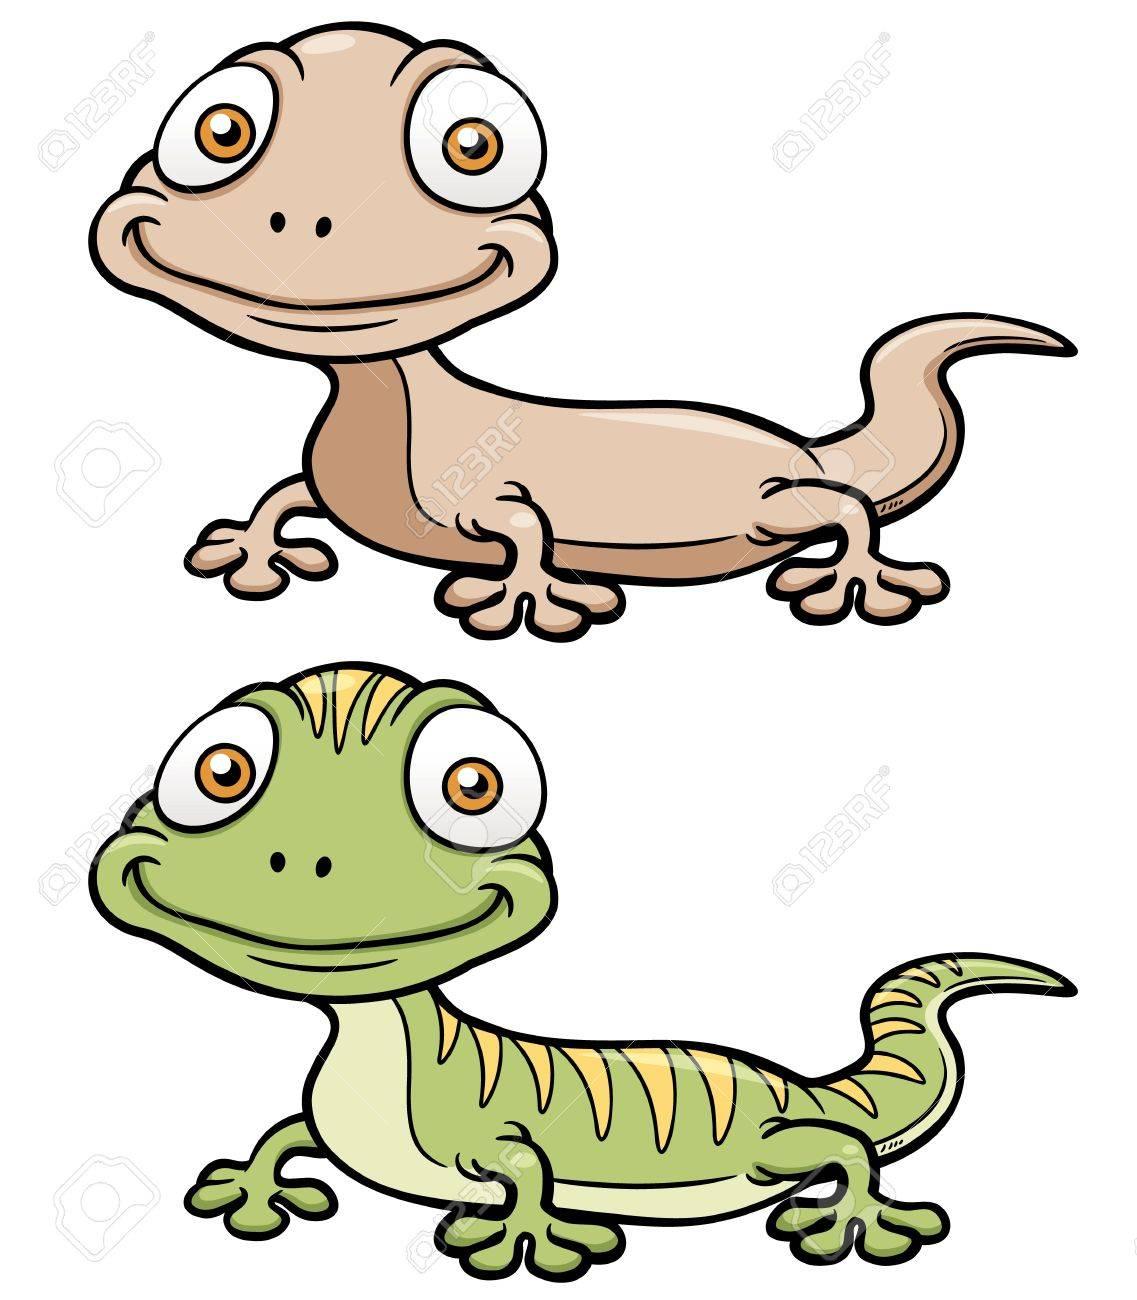 illustration of gecko cartoon royalty free cliparts vectors and rh 123rf com gecko cartoon on youtube gecko cartoon movie